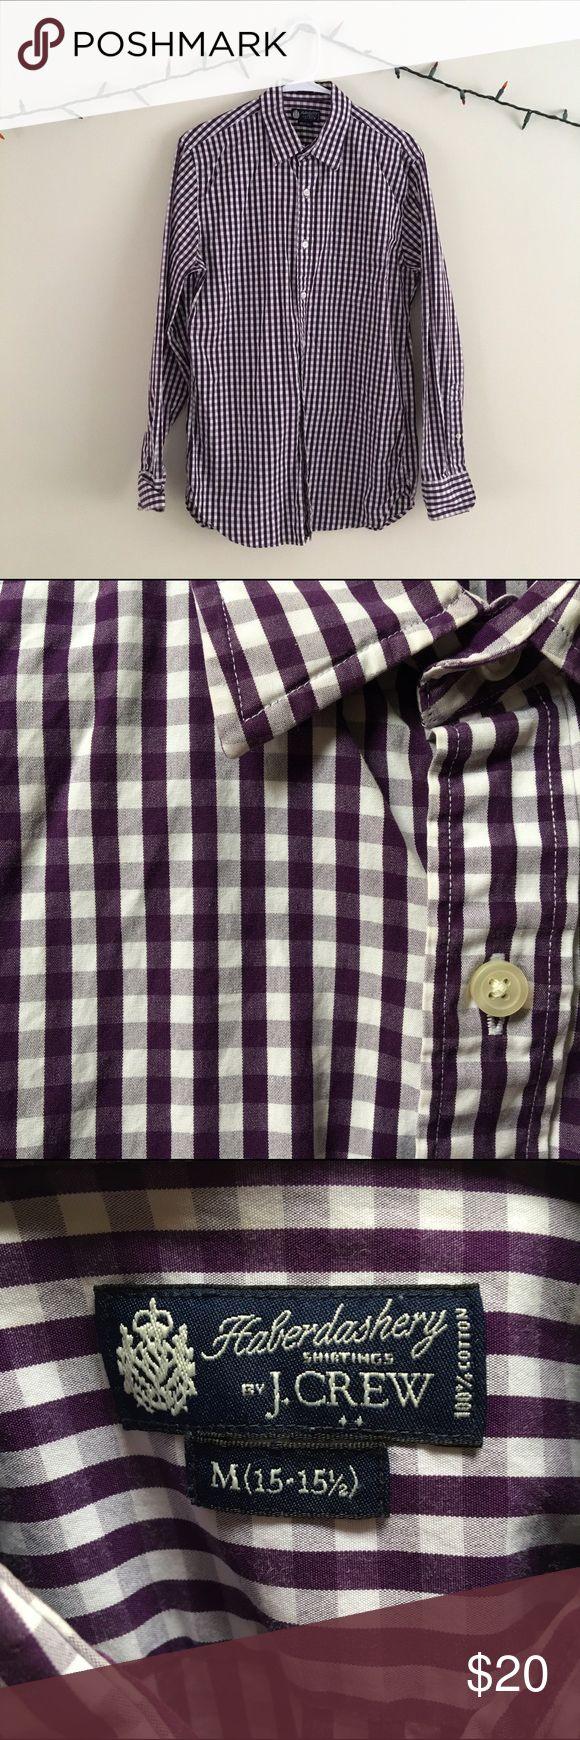 Selling this Purple Checkered Collared Shirt on Poshmark! My username is: jazzhandshero. #shopmycloset #poshmark #fashion #shopping #style #forsale #J. Crew #Other